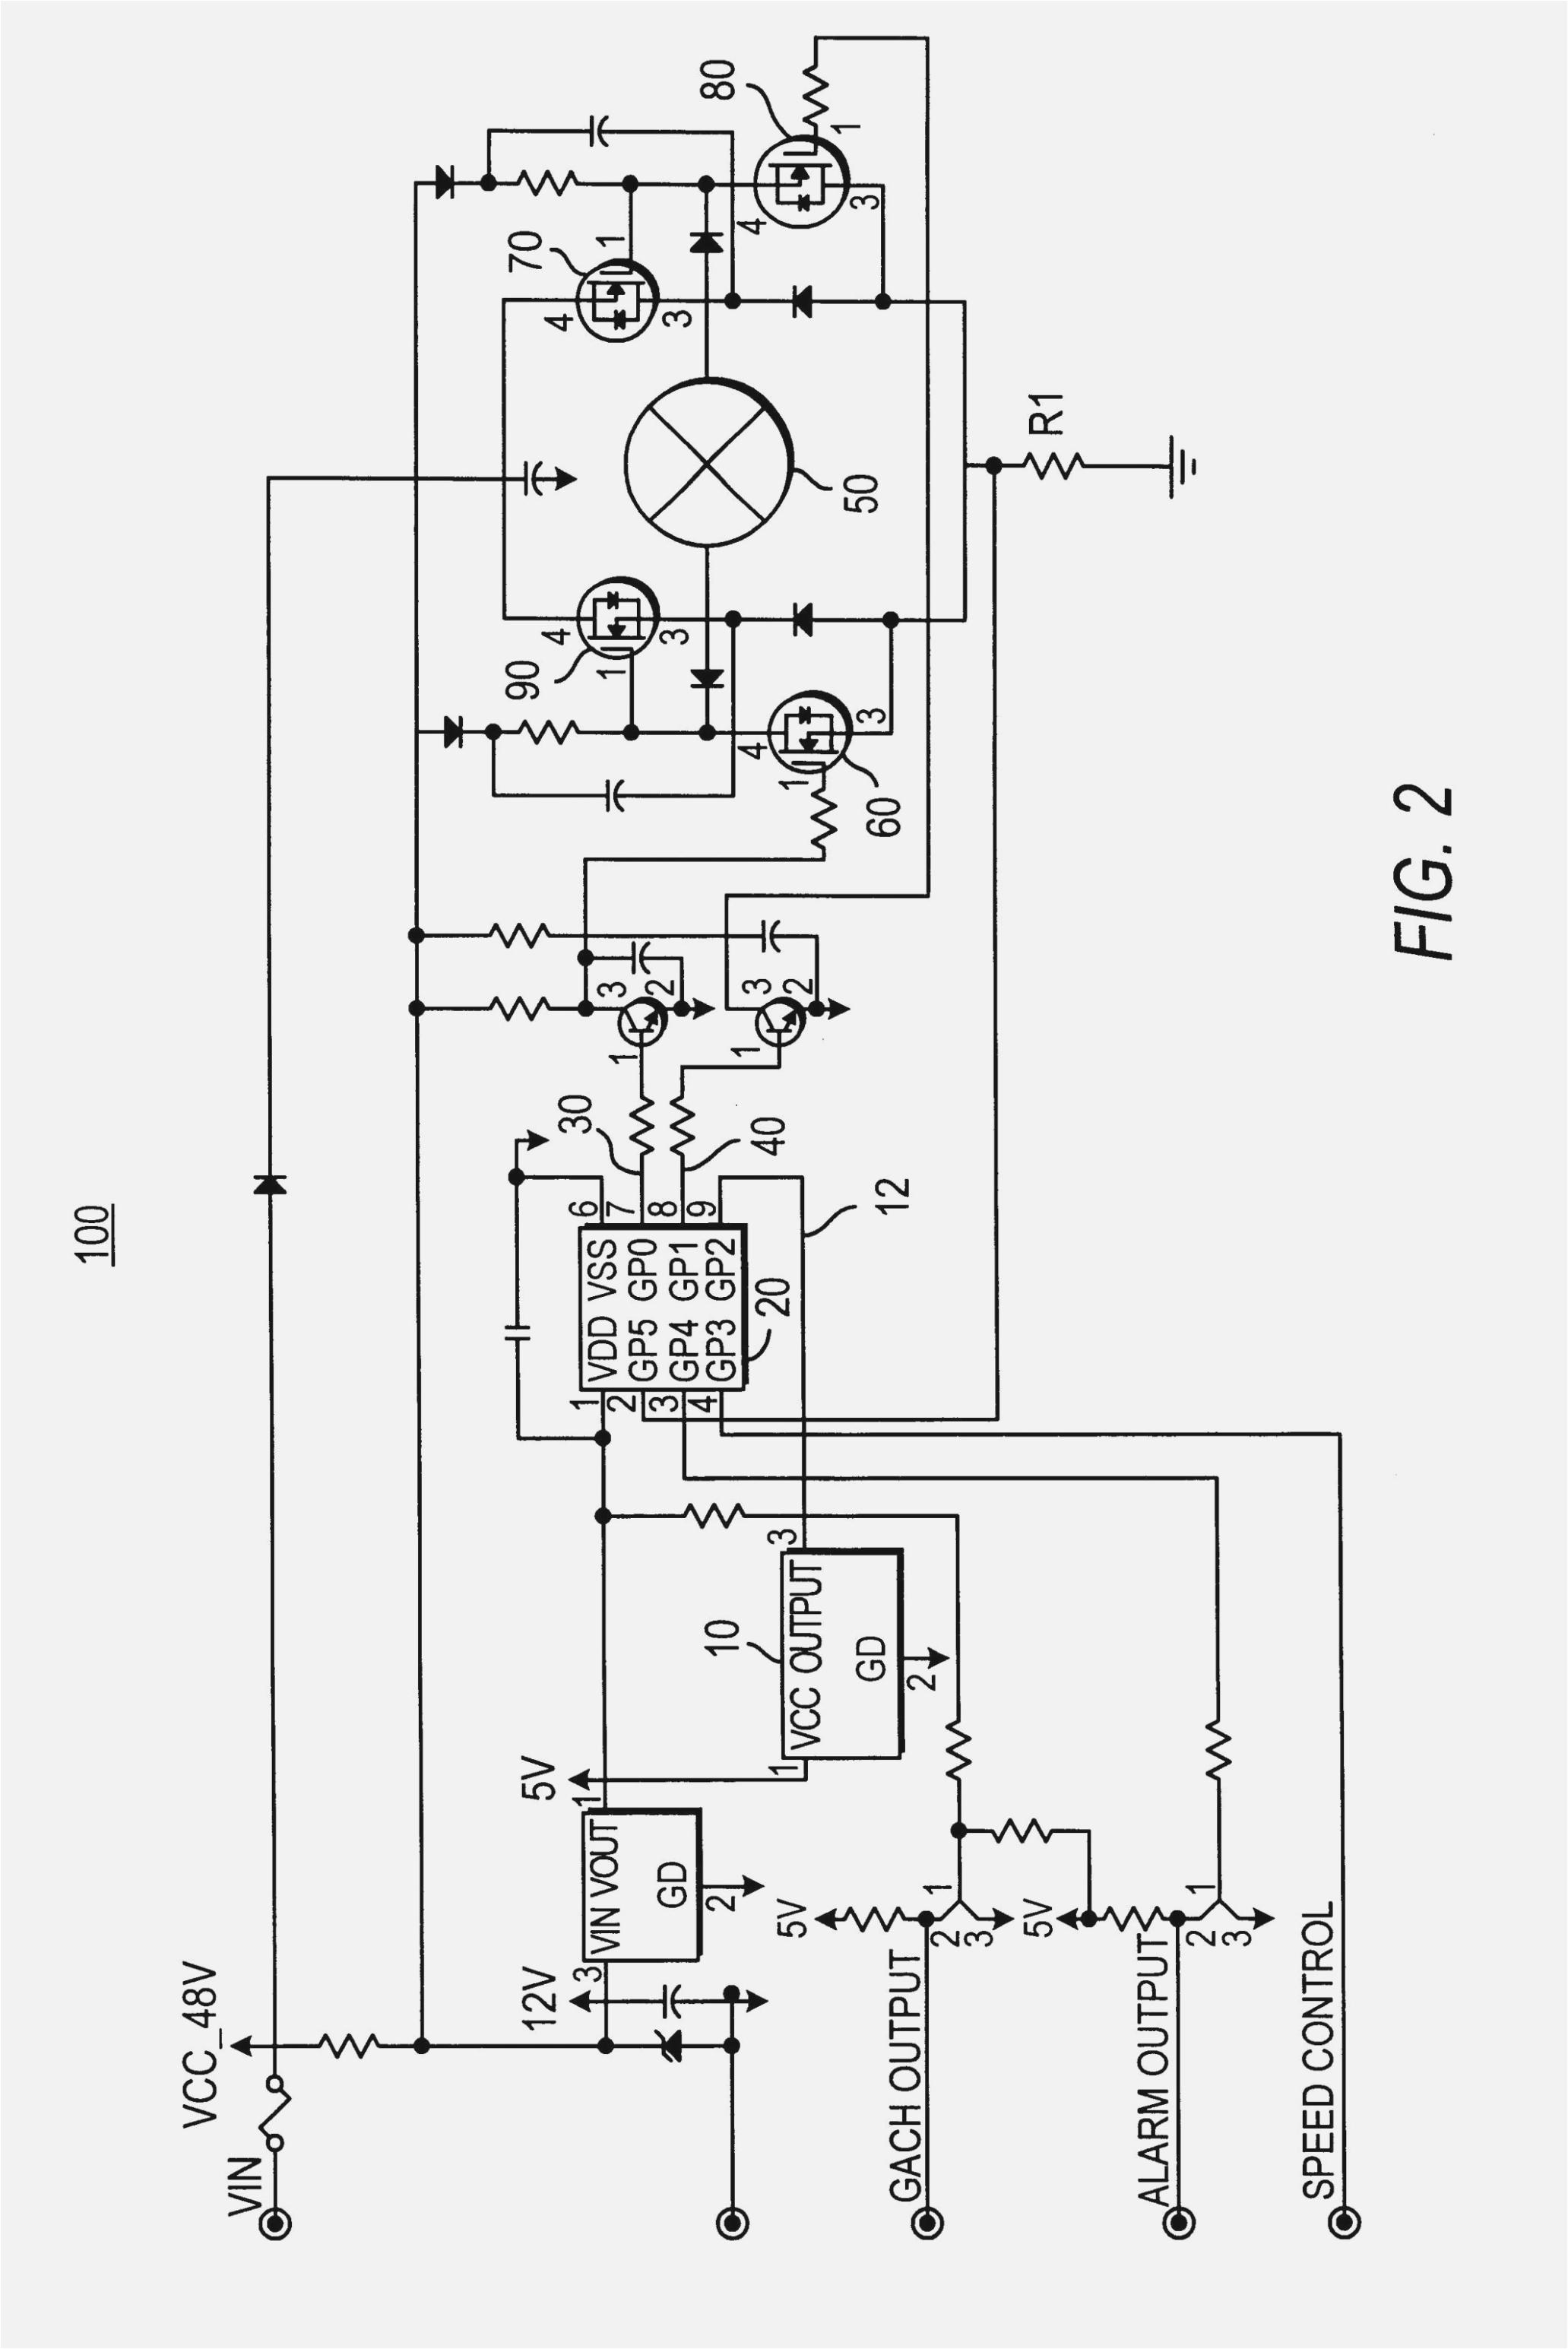 jlg scissor lift wiring diagram electrical circuit beautiful scissor jlg scissor lift battery diagram png